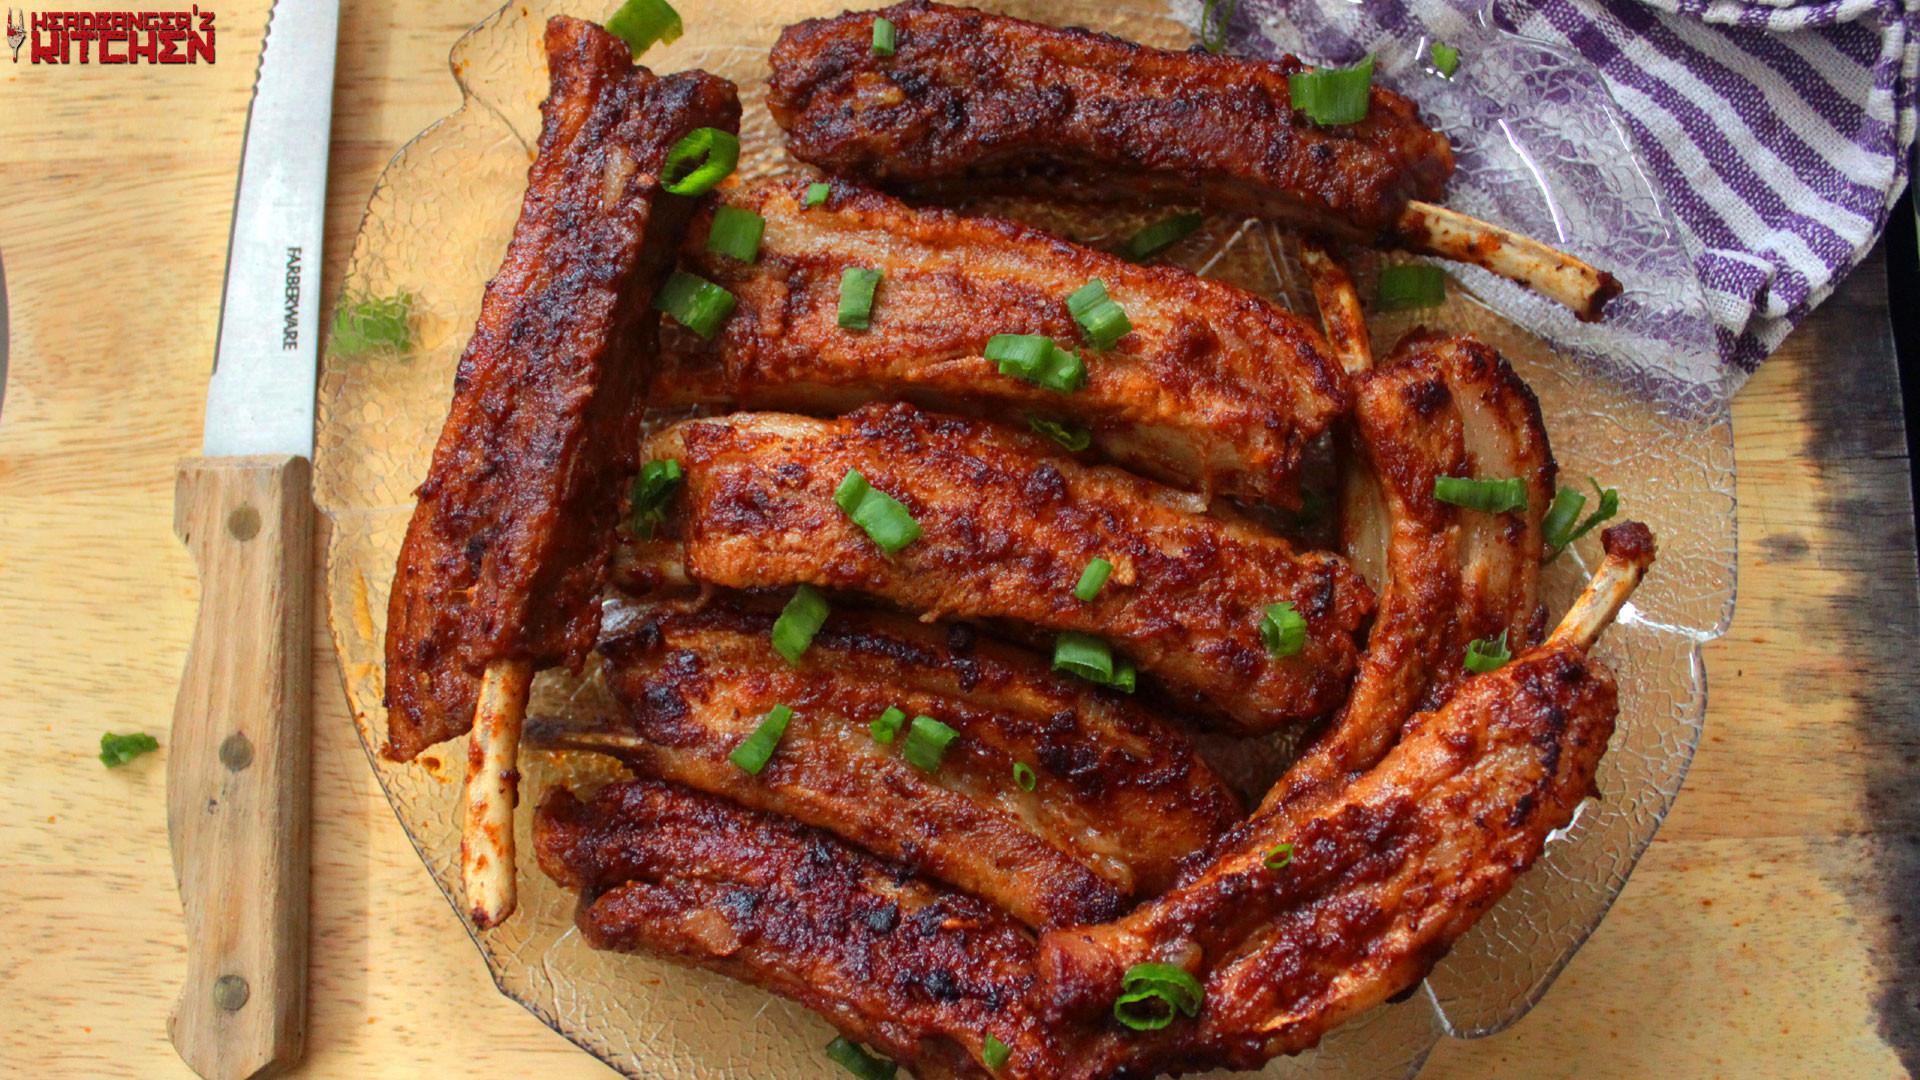 Pork Spare Ribs Recipe  Keto BBQ Pork Spare Ribs Headbanger s Kitchen Keto All